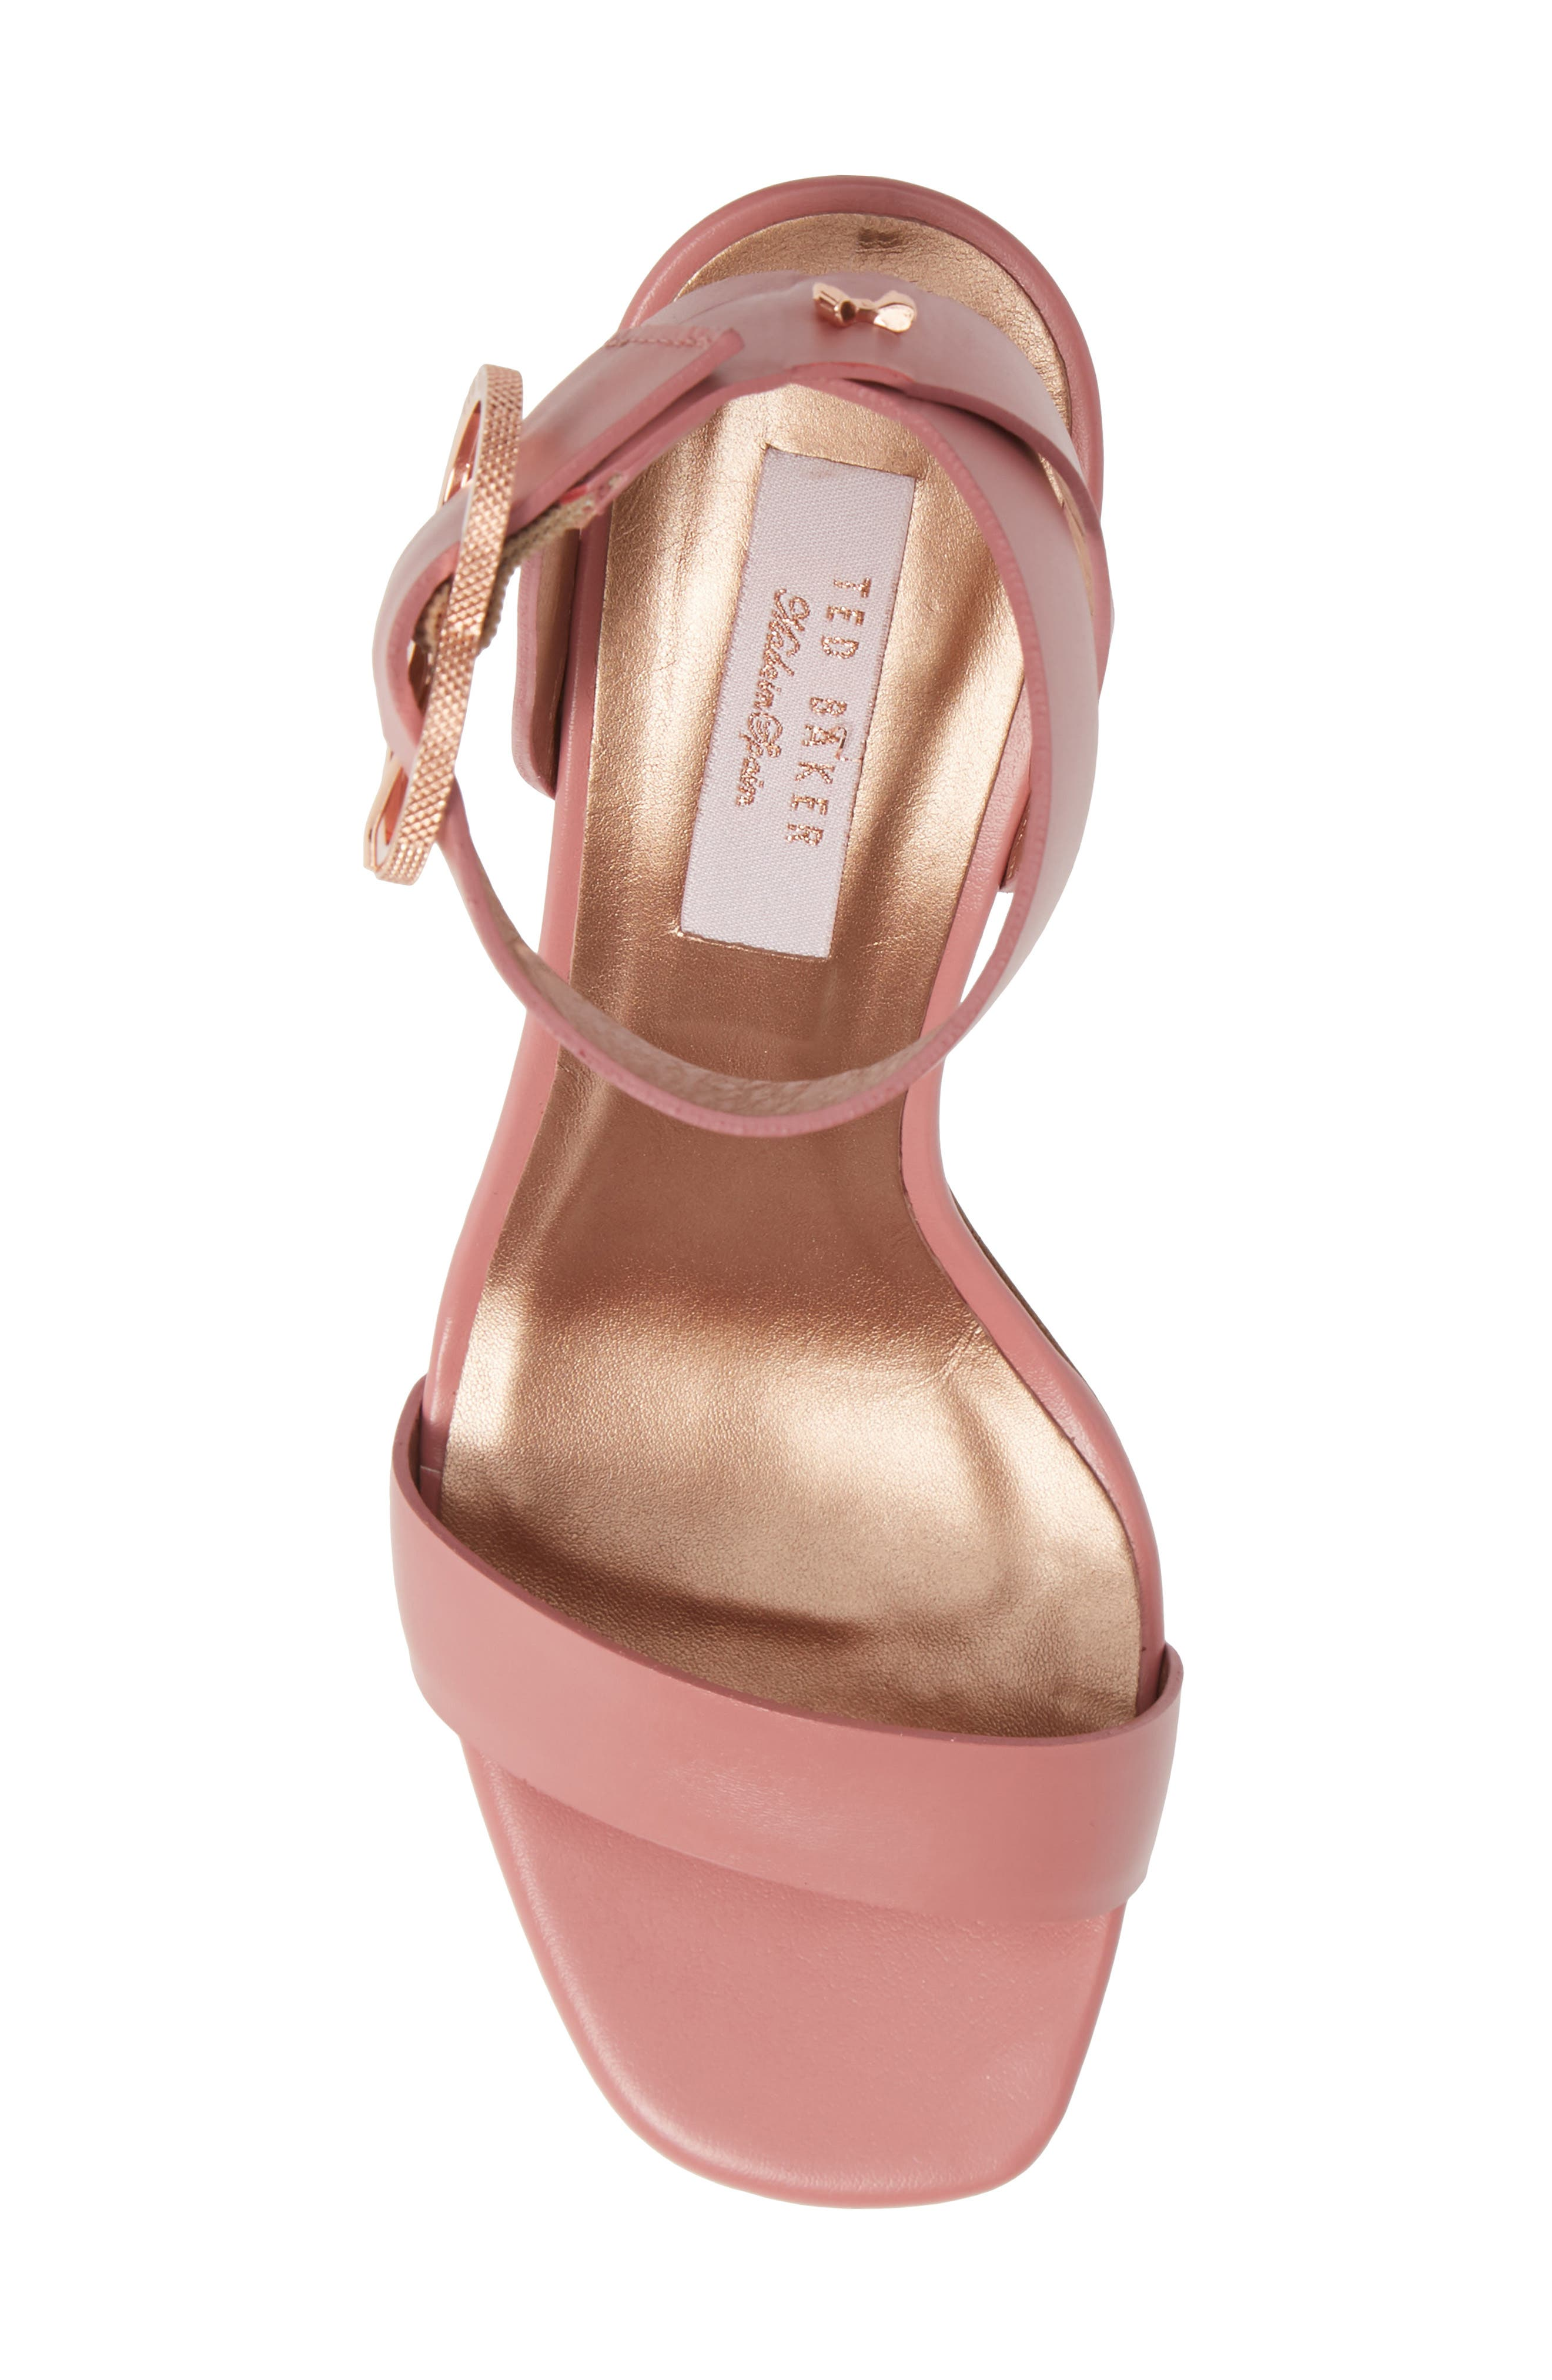 Vallama Block Heel Sandal,                             Alternate thumbnail 5, color,                             PINK LEATHER